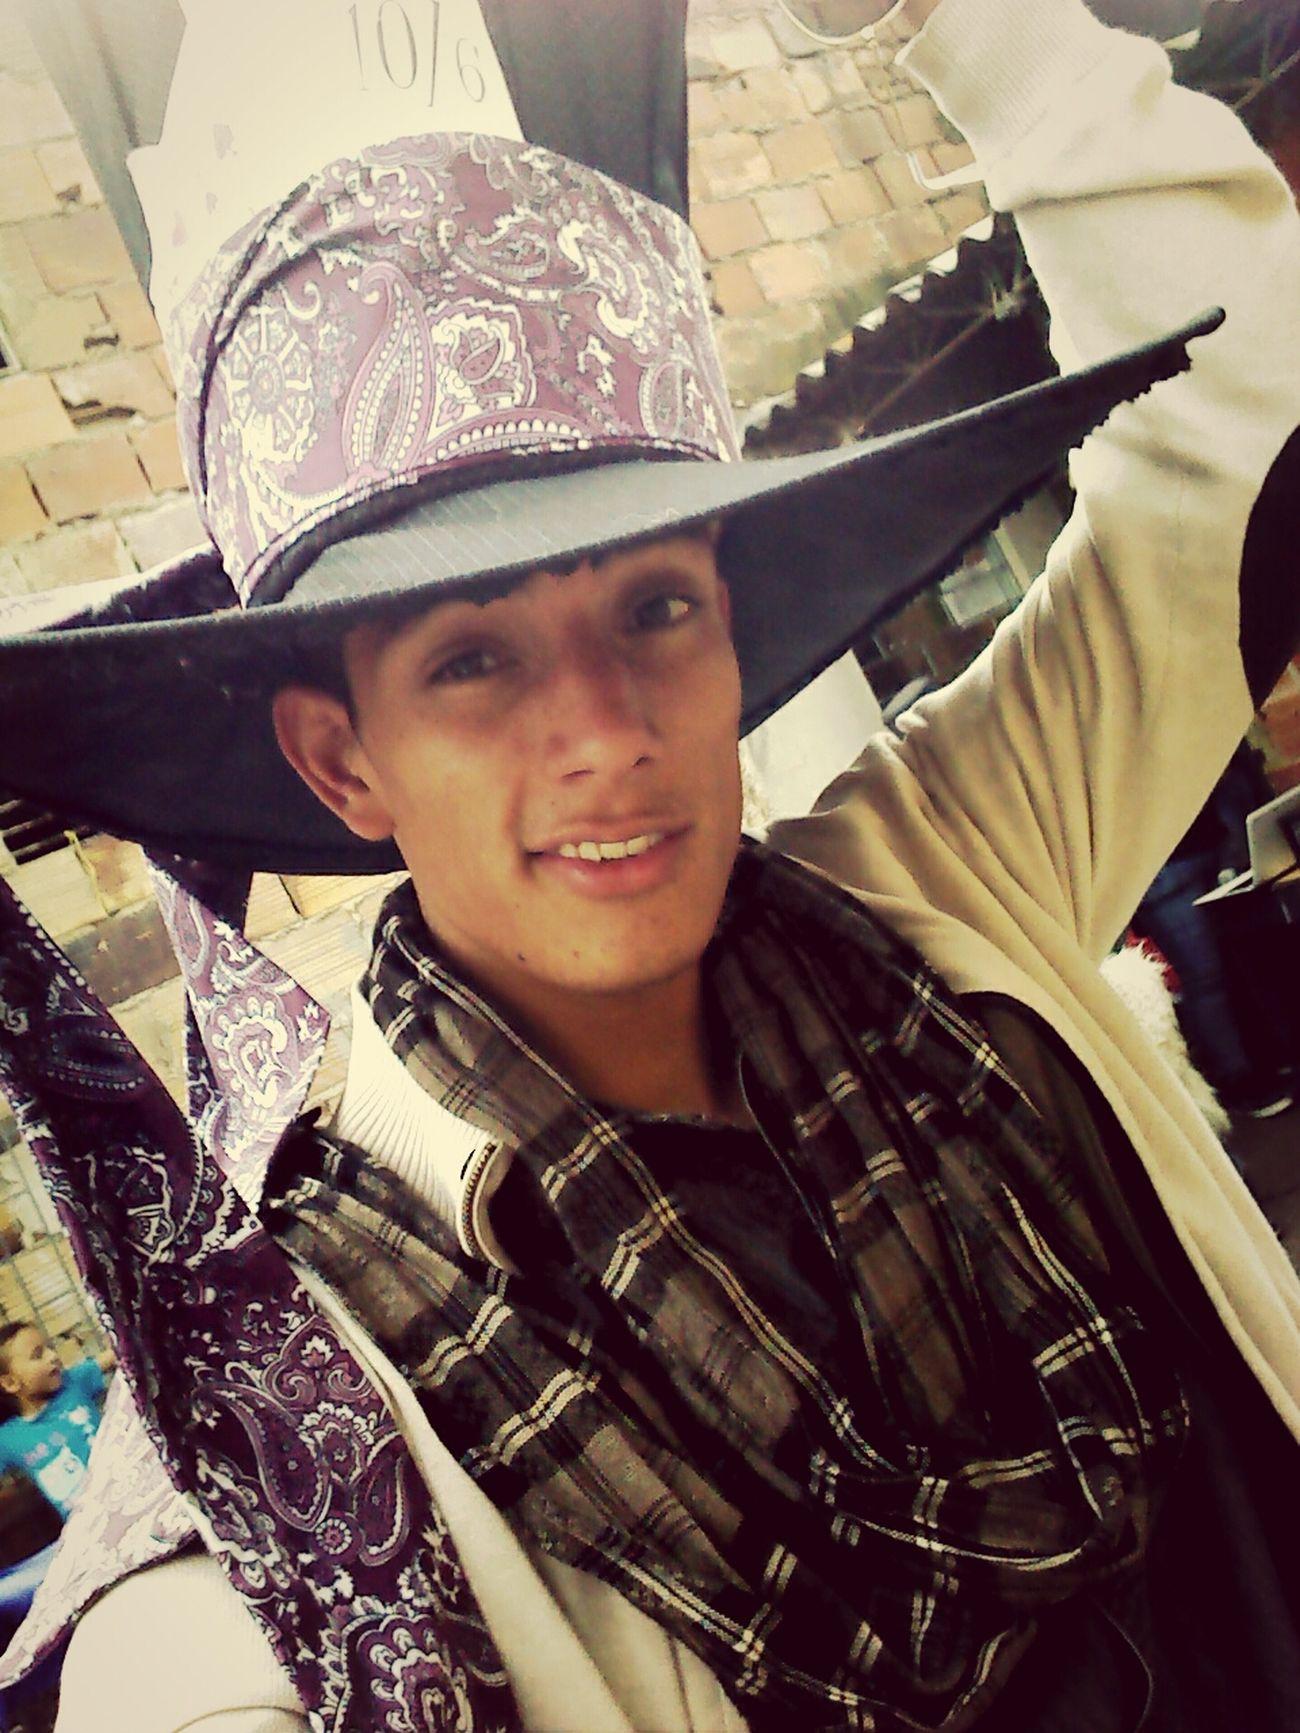 Sombrerero loco :3